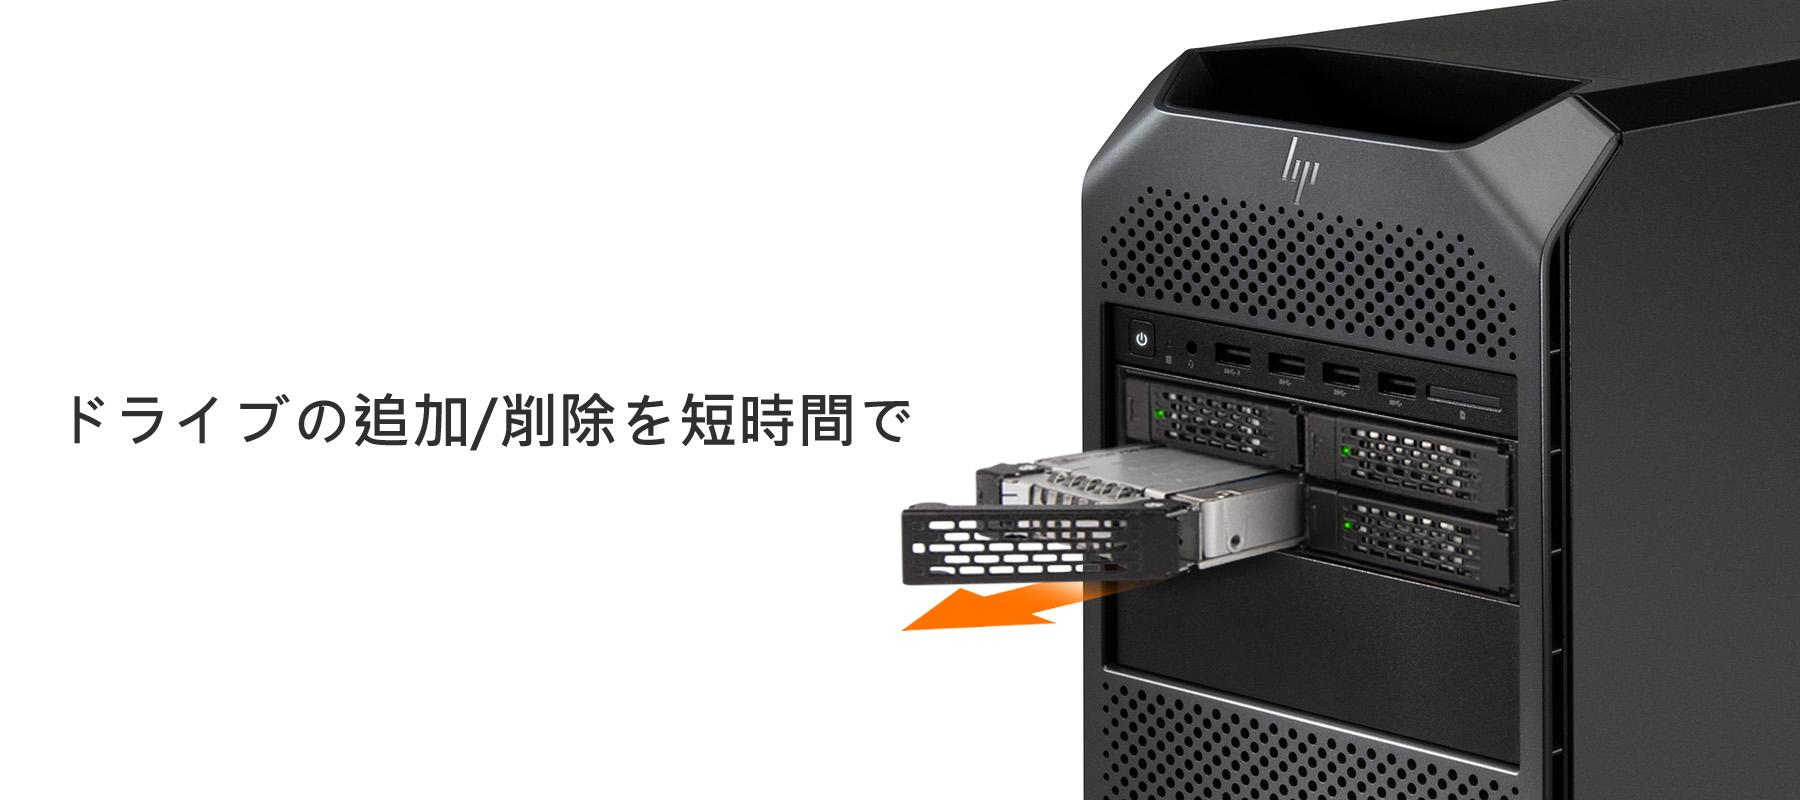 MB699VP-B_V2-removable_drive